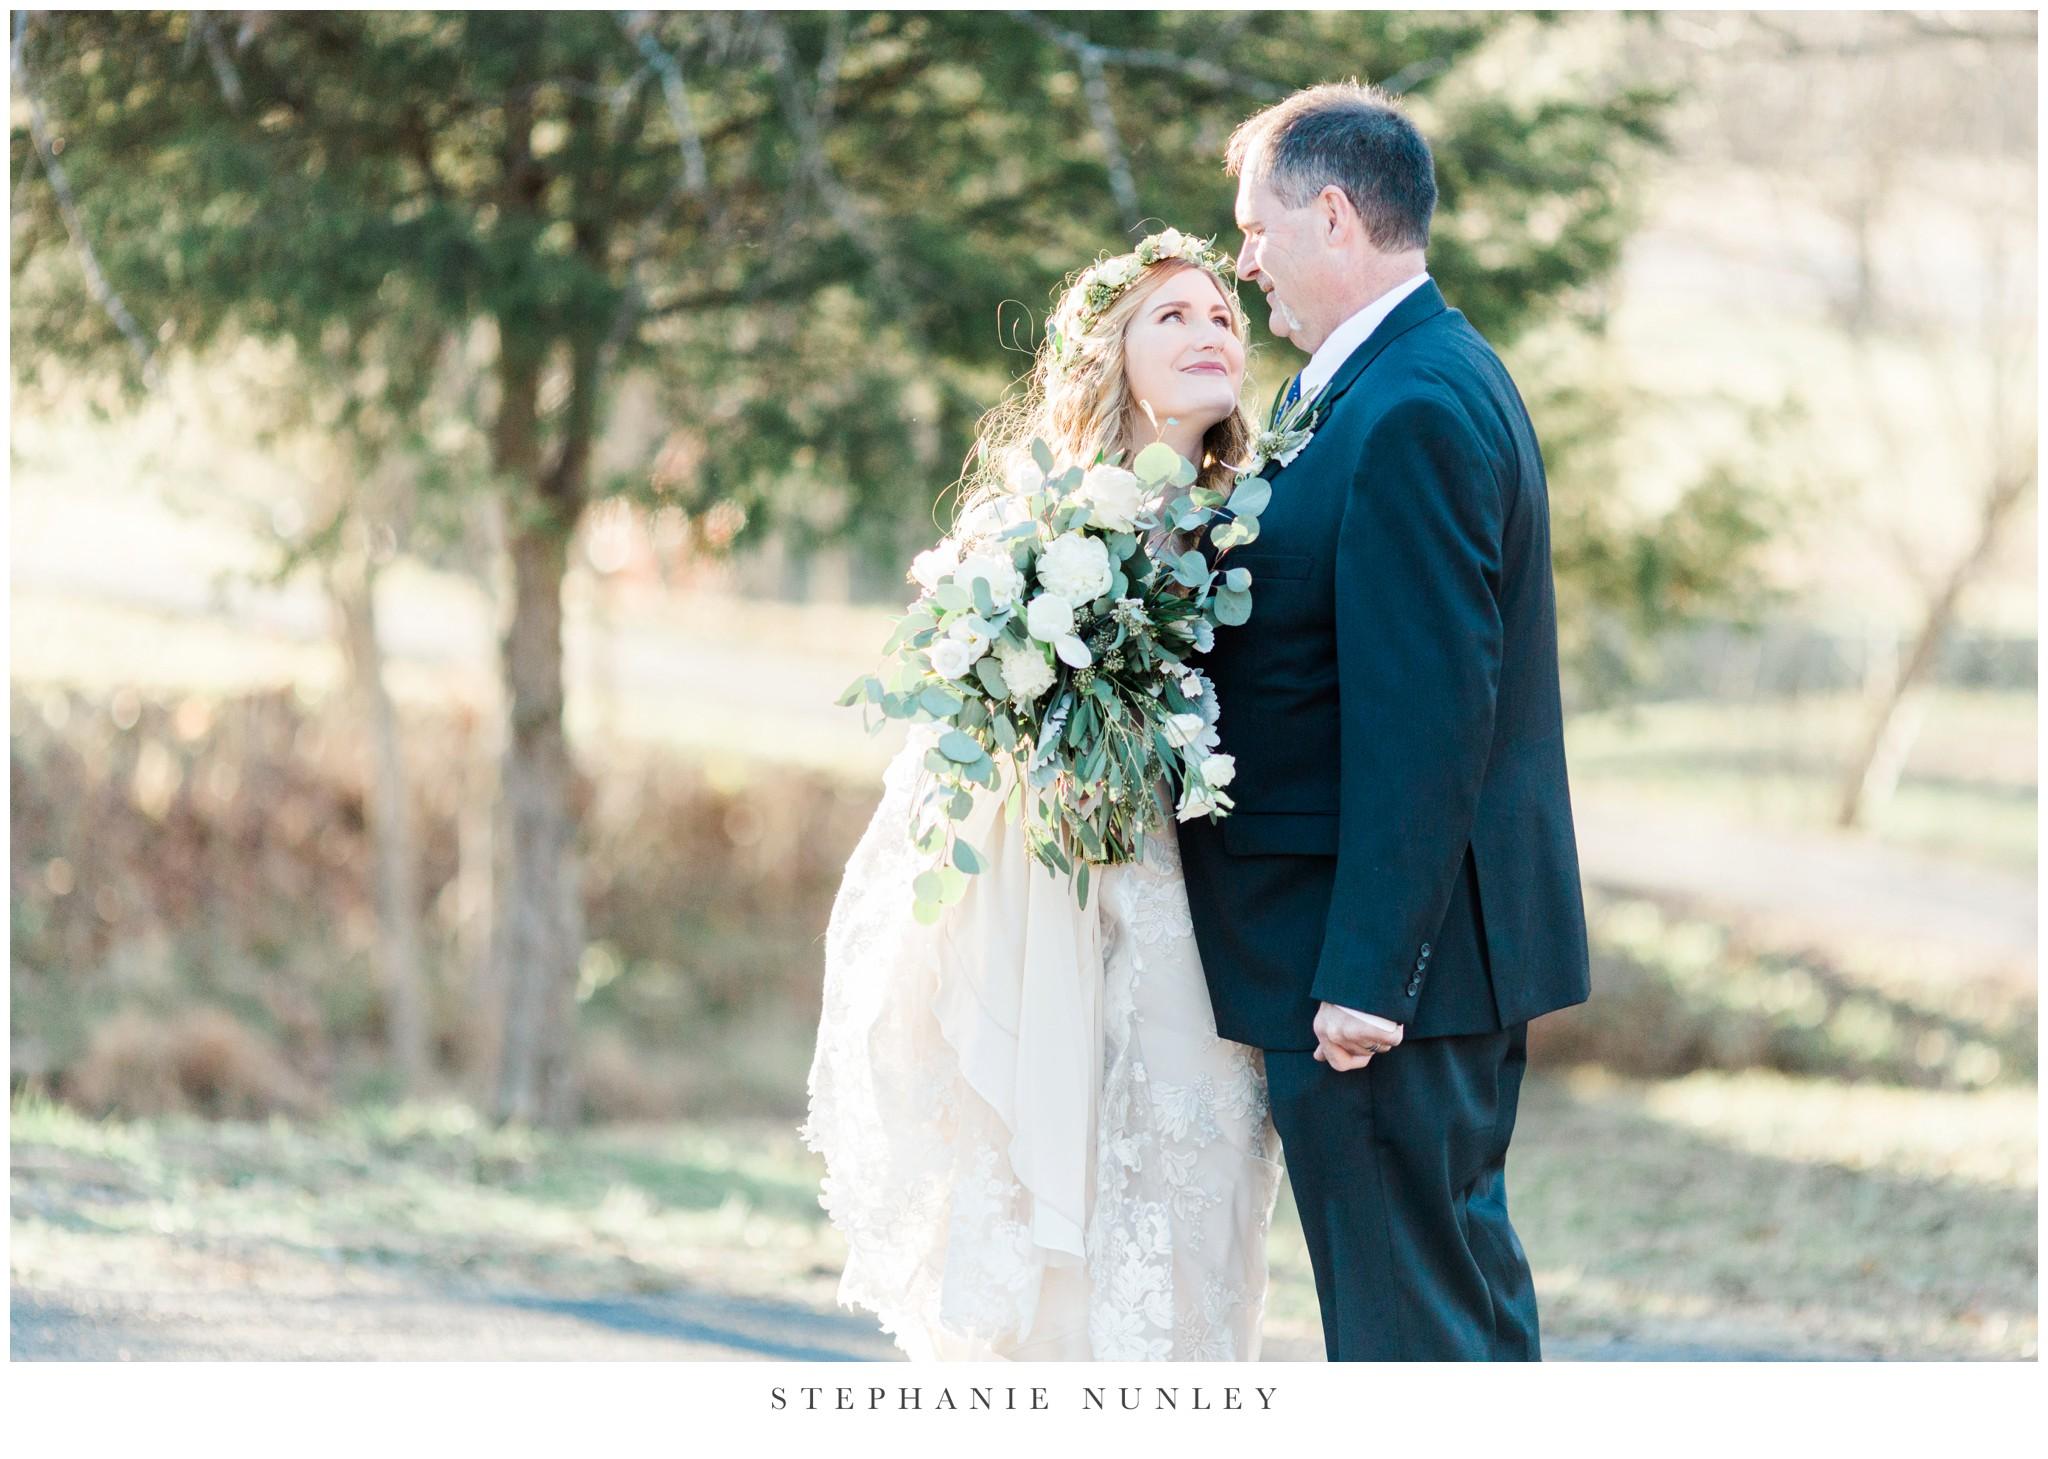 sassafrass-springs-vineyard-film-wedding-photos-58.jpg